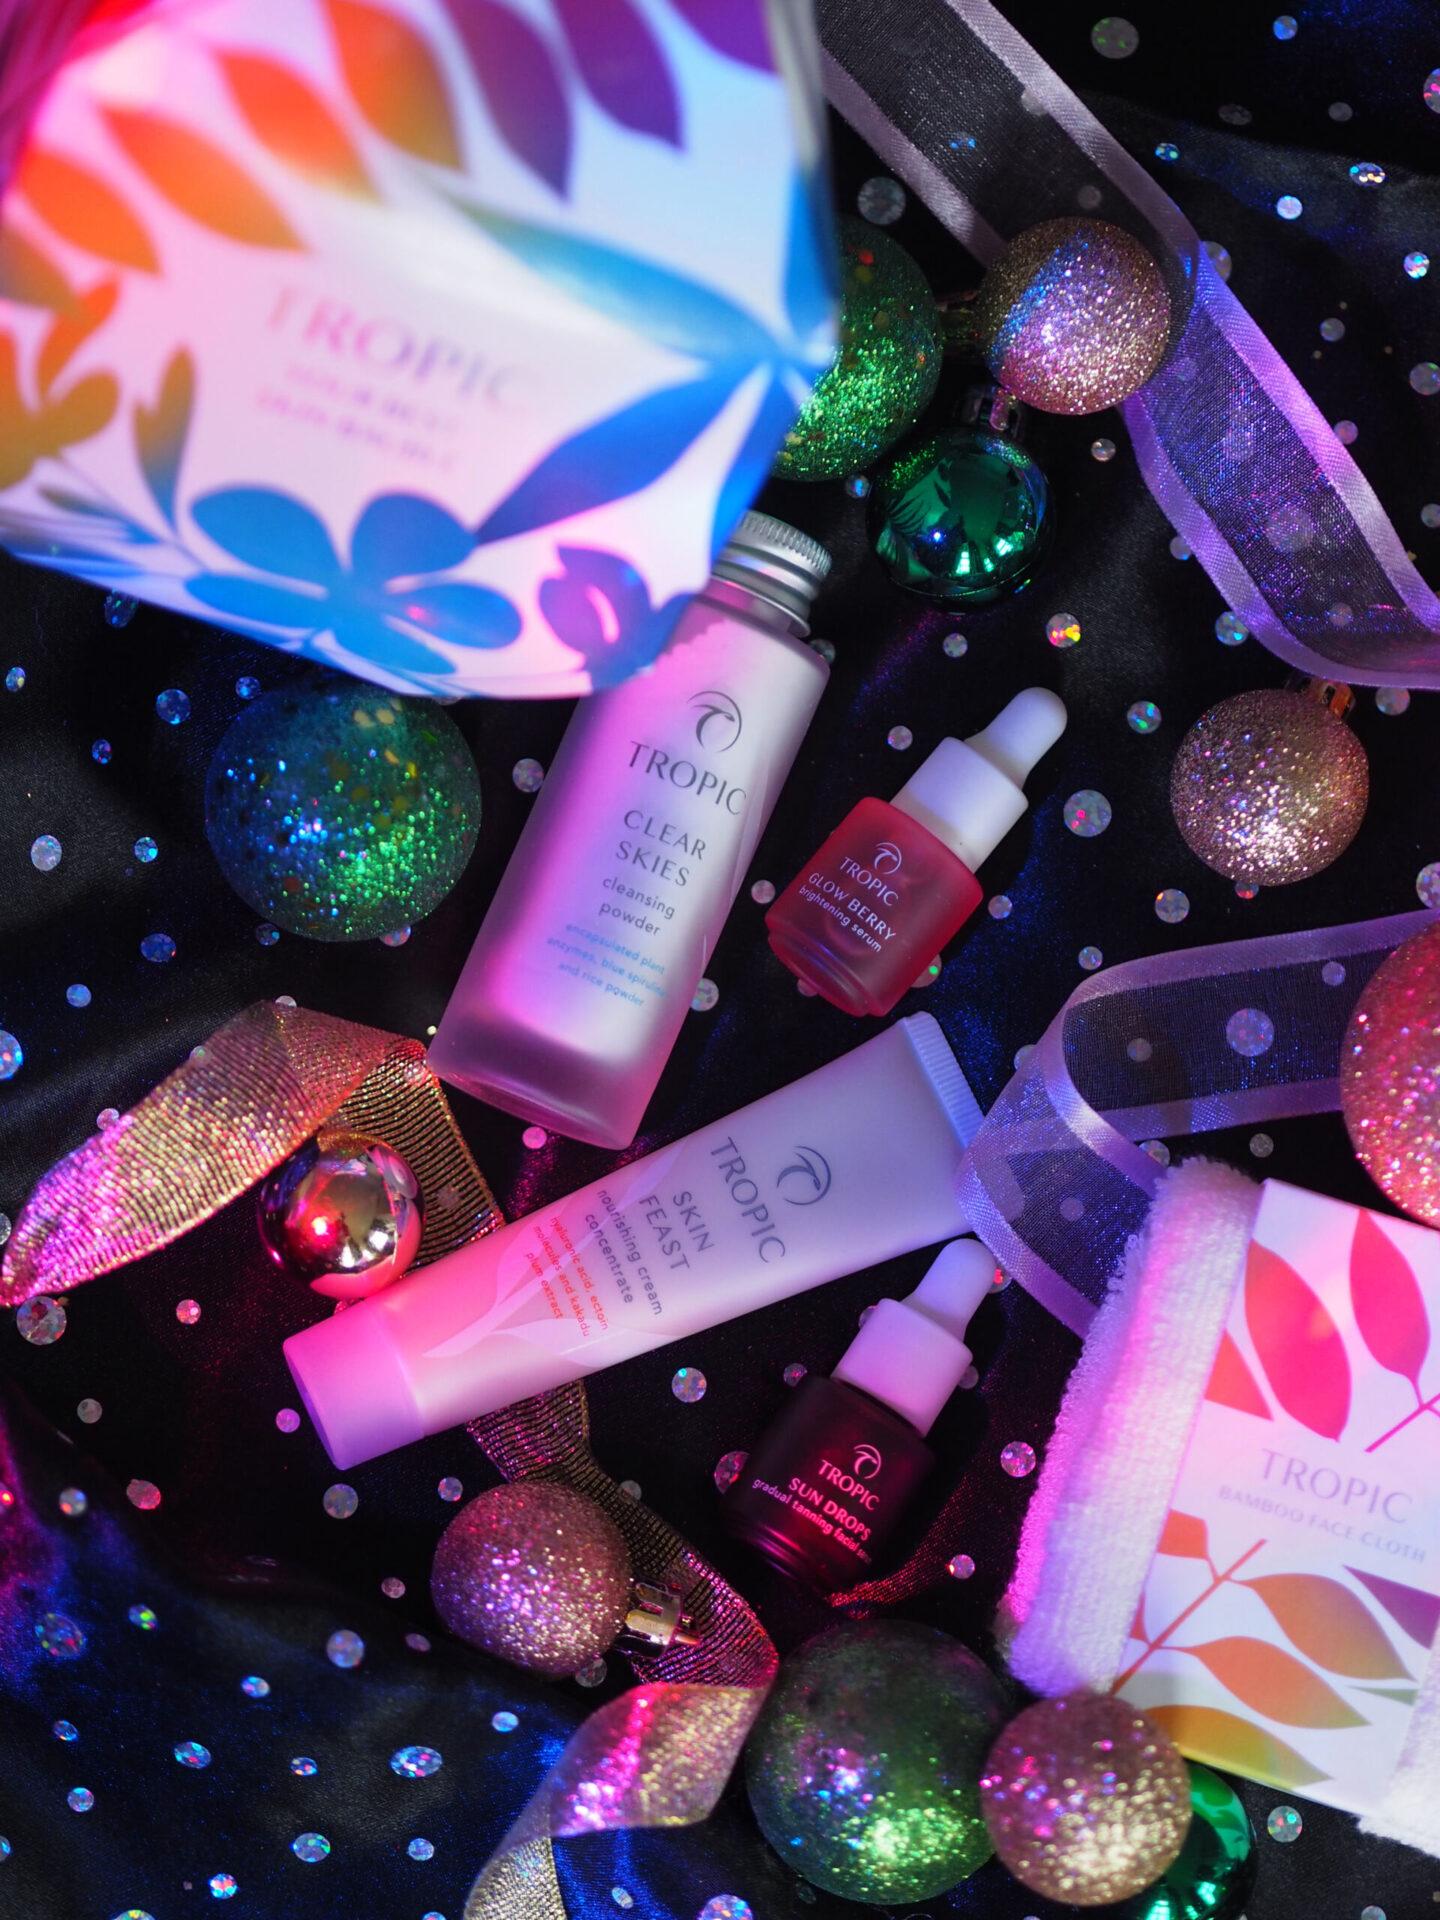 Tropic skincare bauble christmas 2020